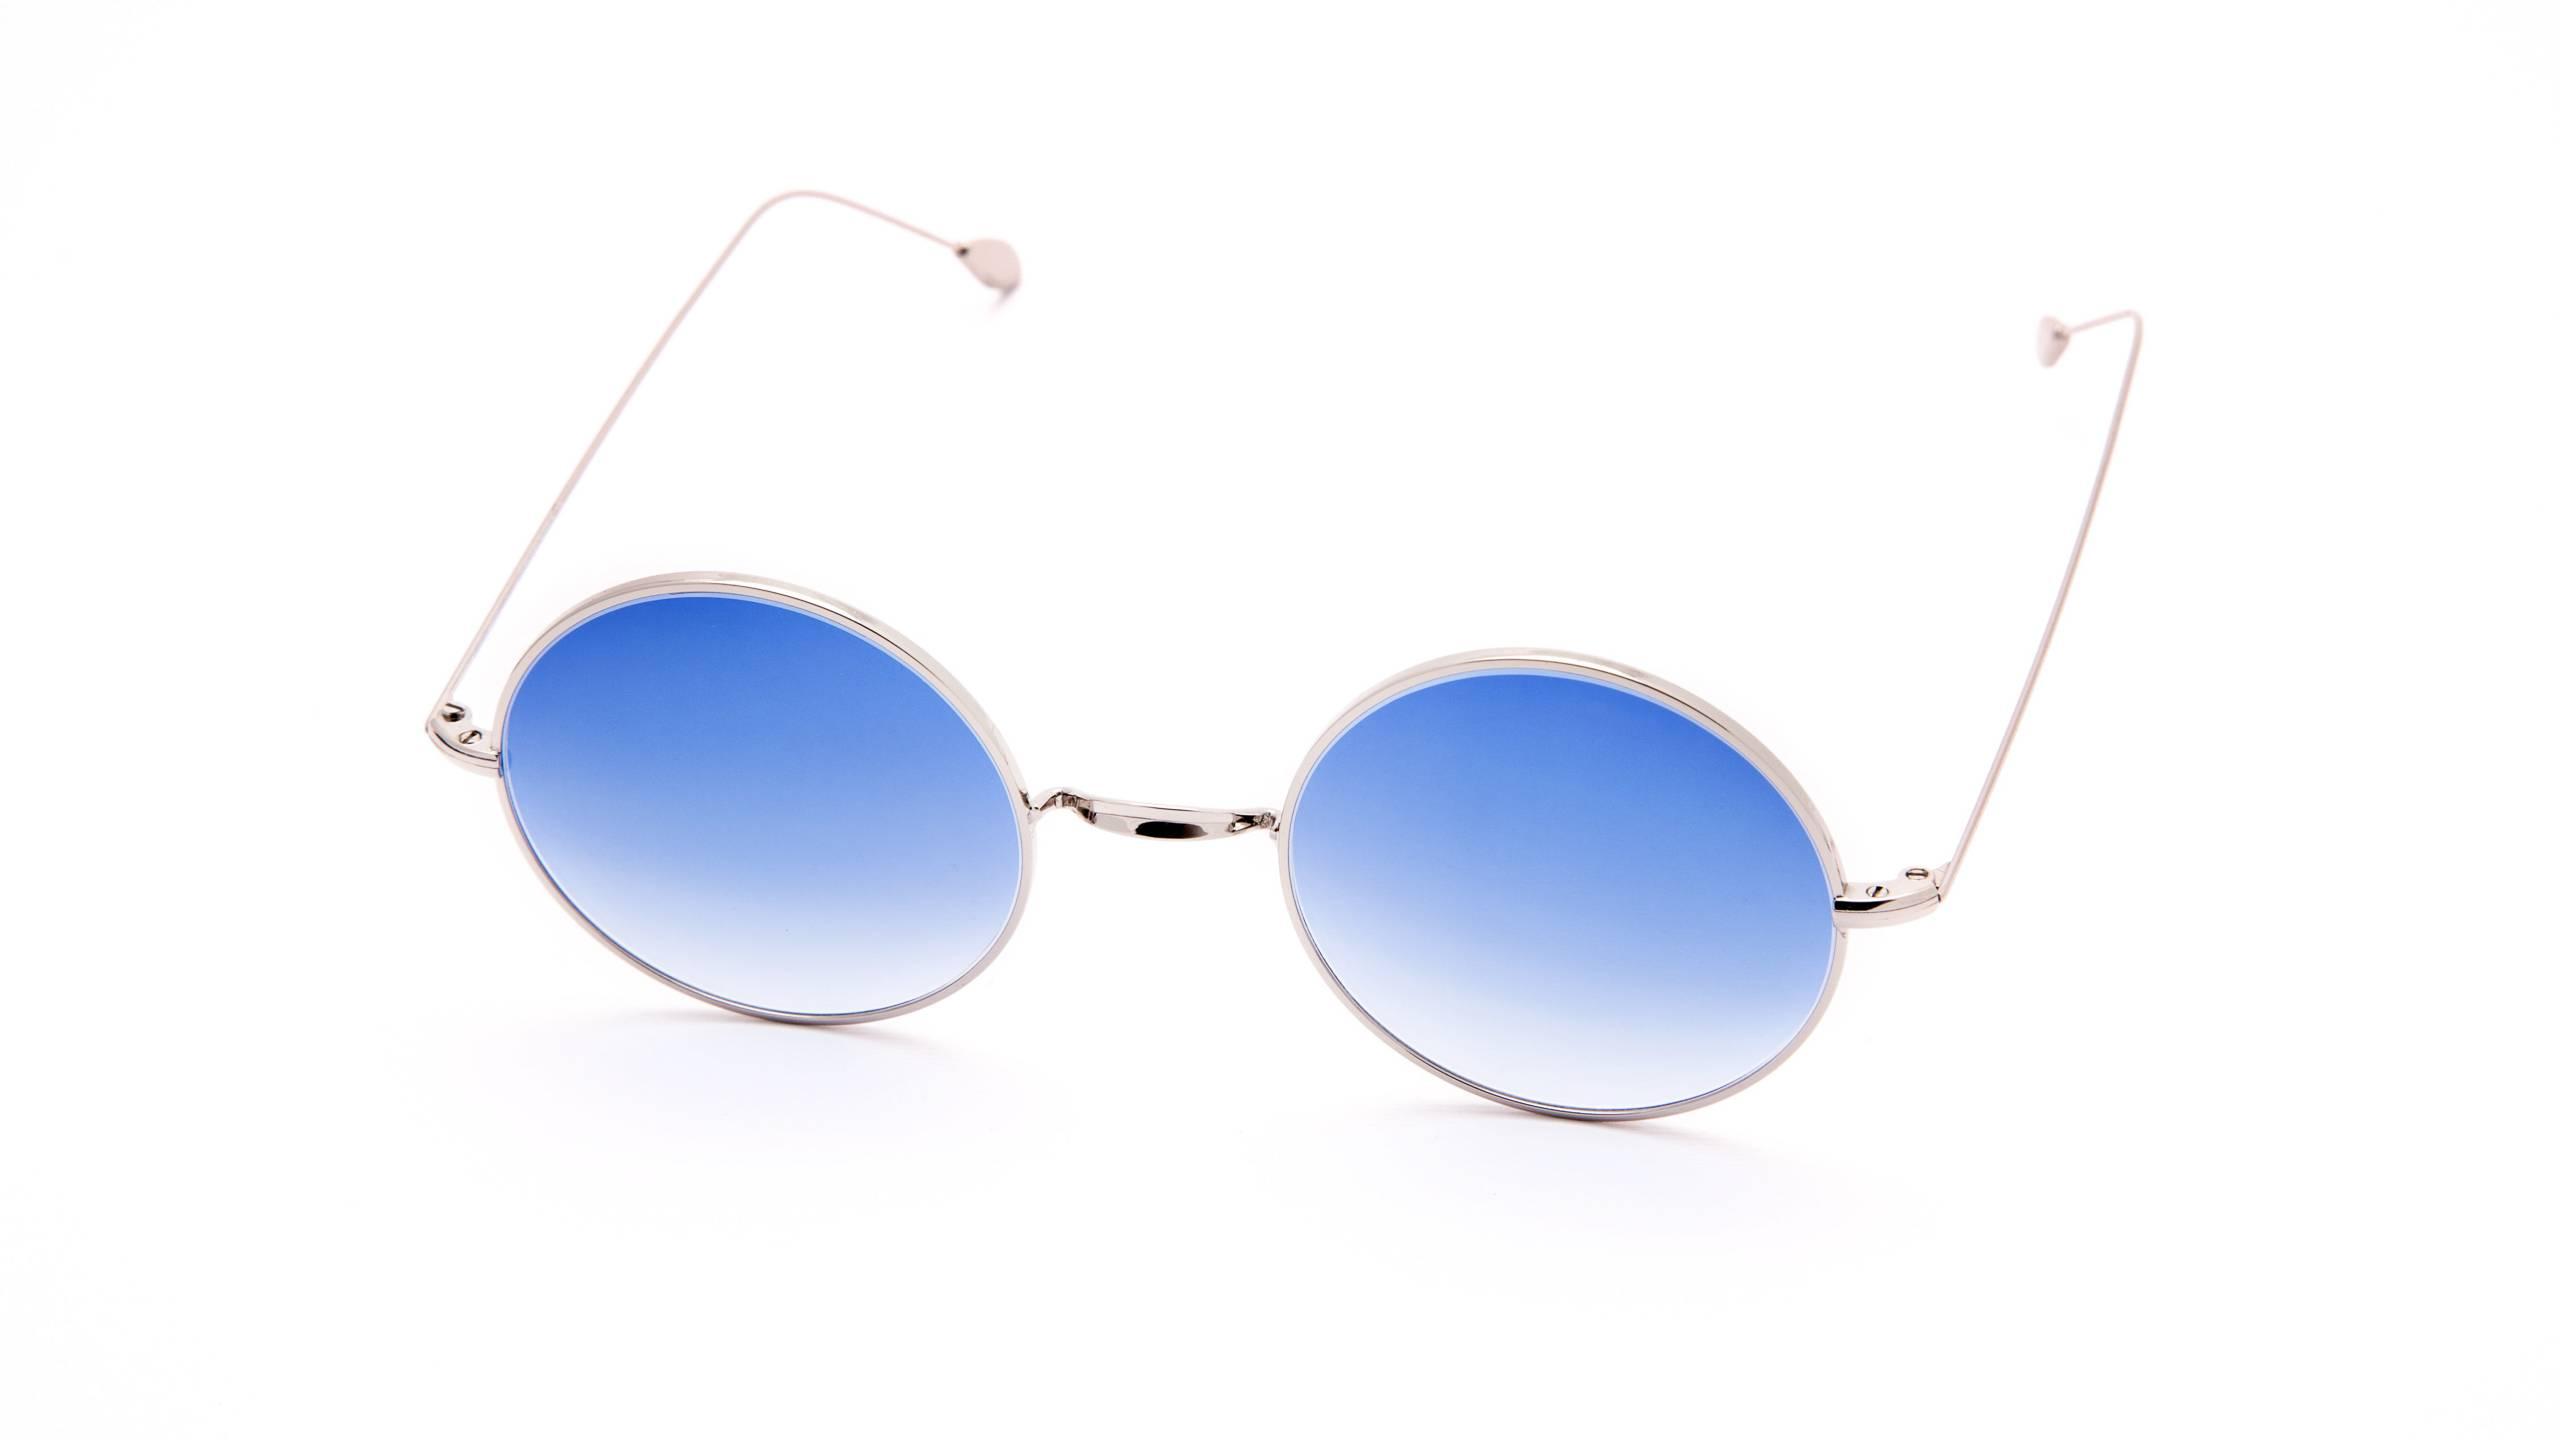 eyeglasses-Nathan-Kaltermann-made-in-Italy-PORTOFINO-ARG-UNI-SOLE2-